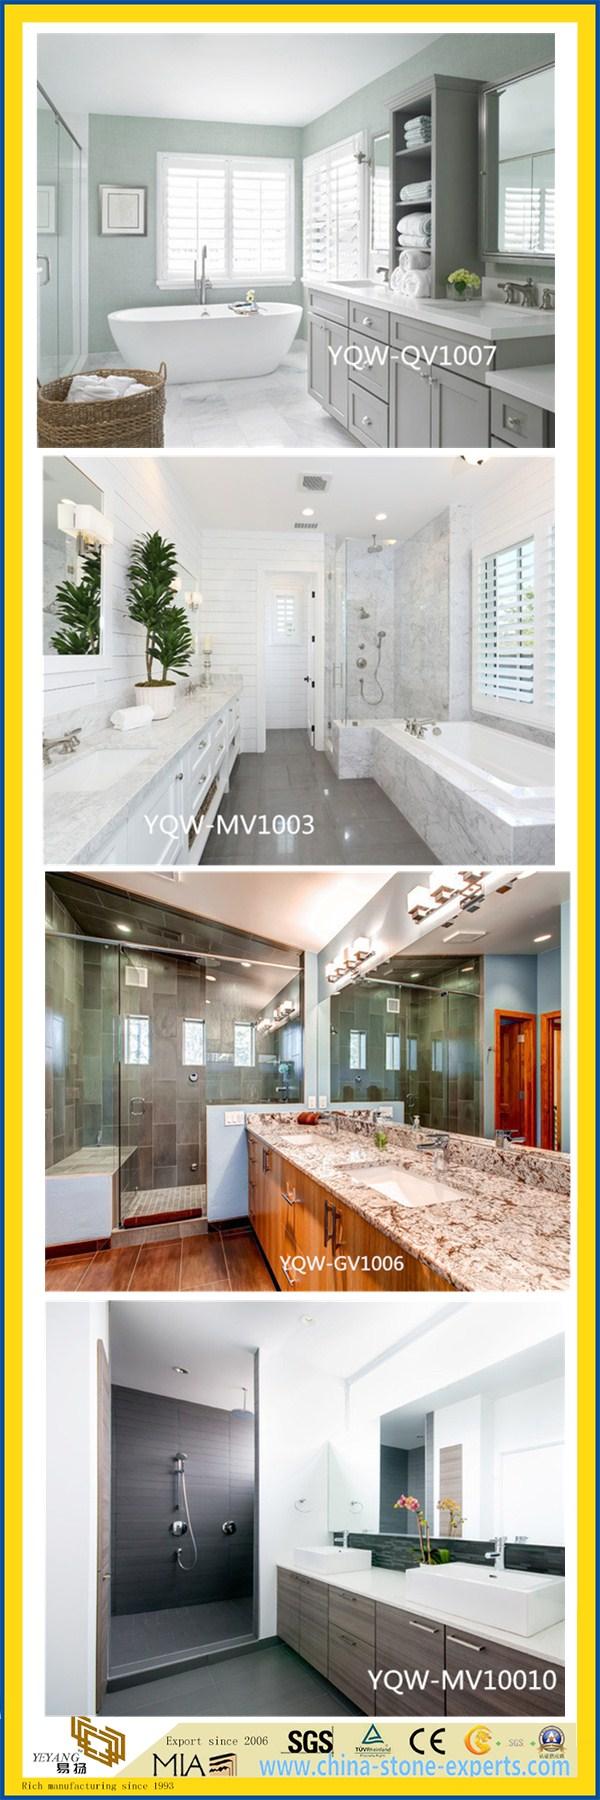 Polished White Artificial Quartz Vanity Top for Home & Hotel Bathroom